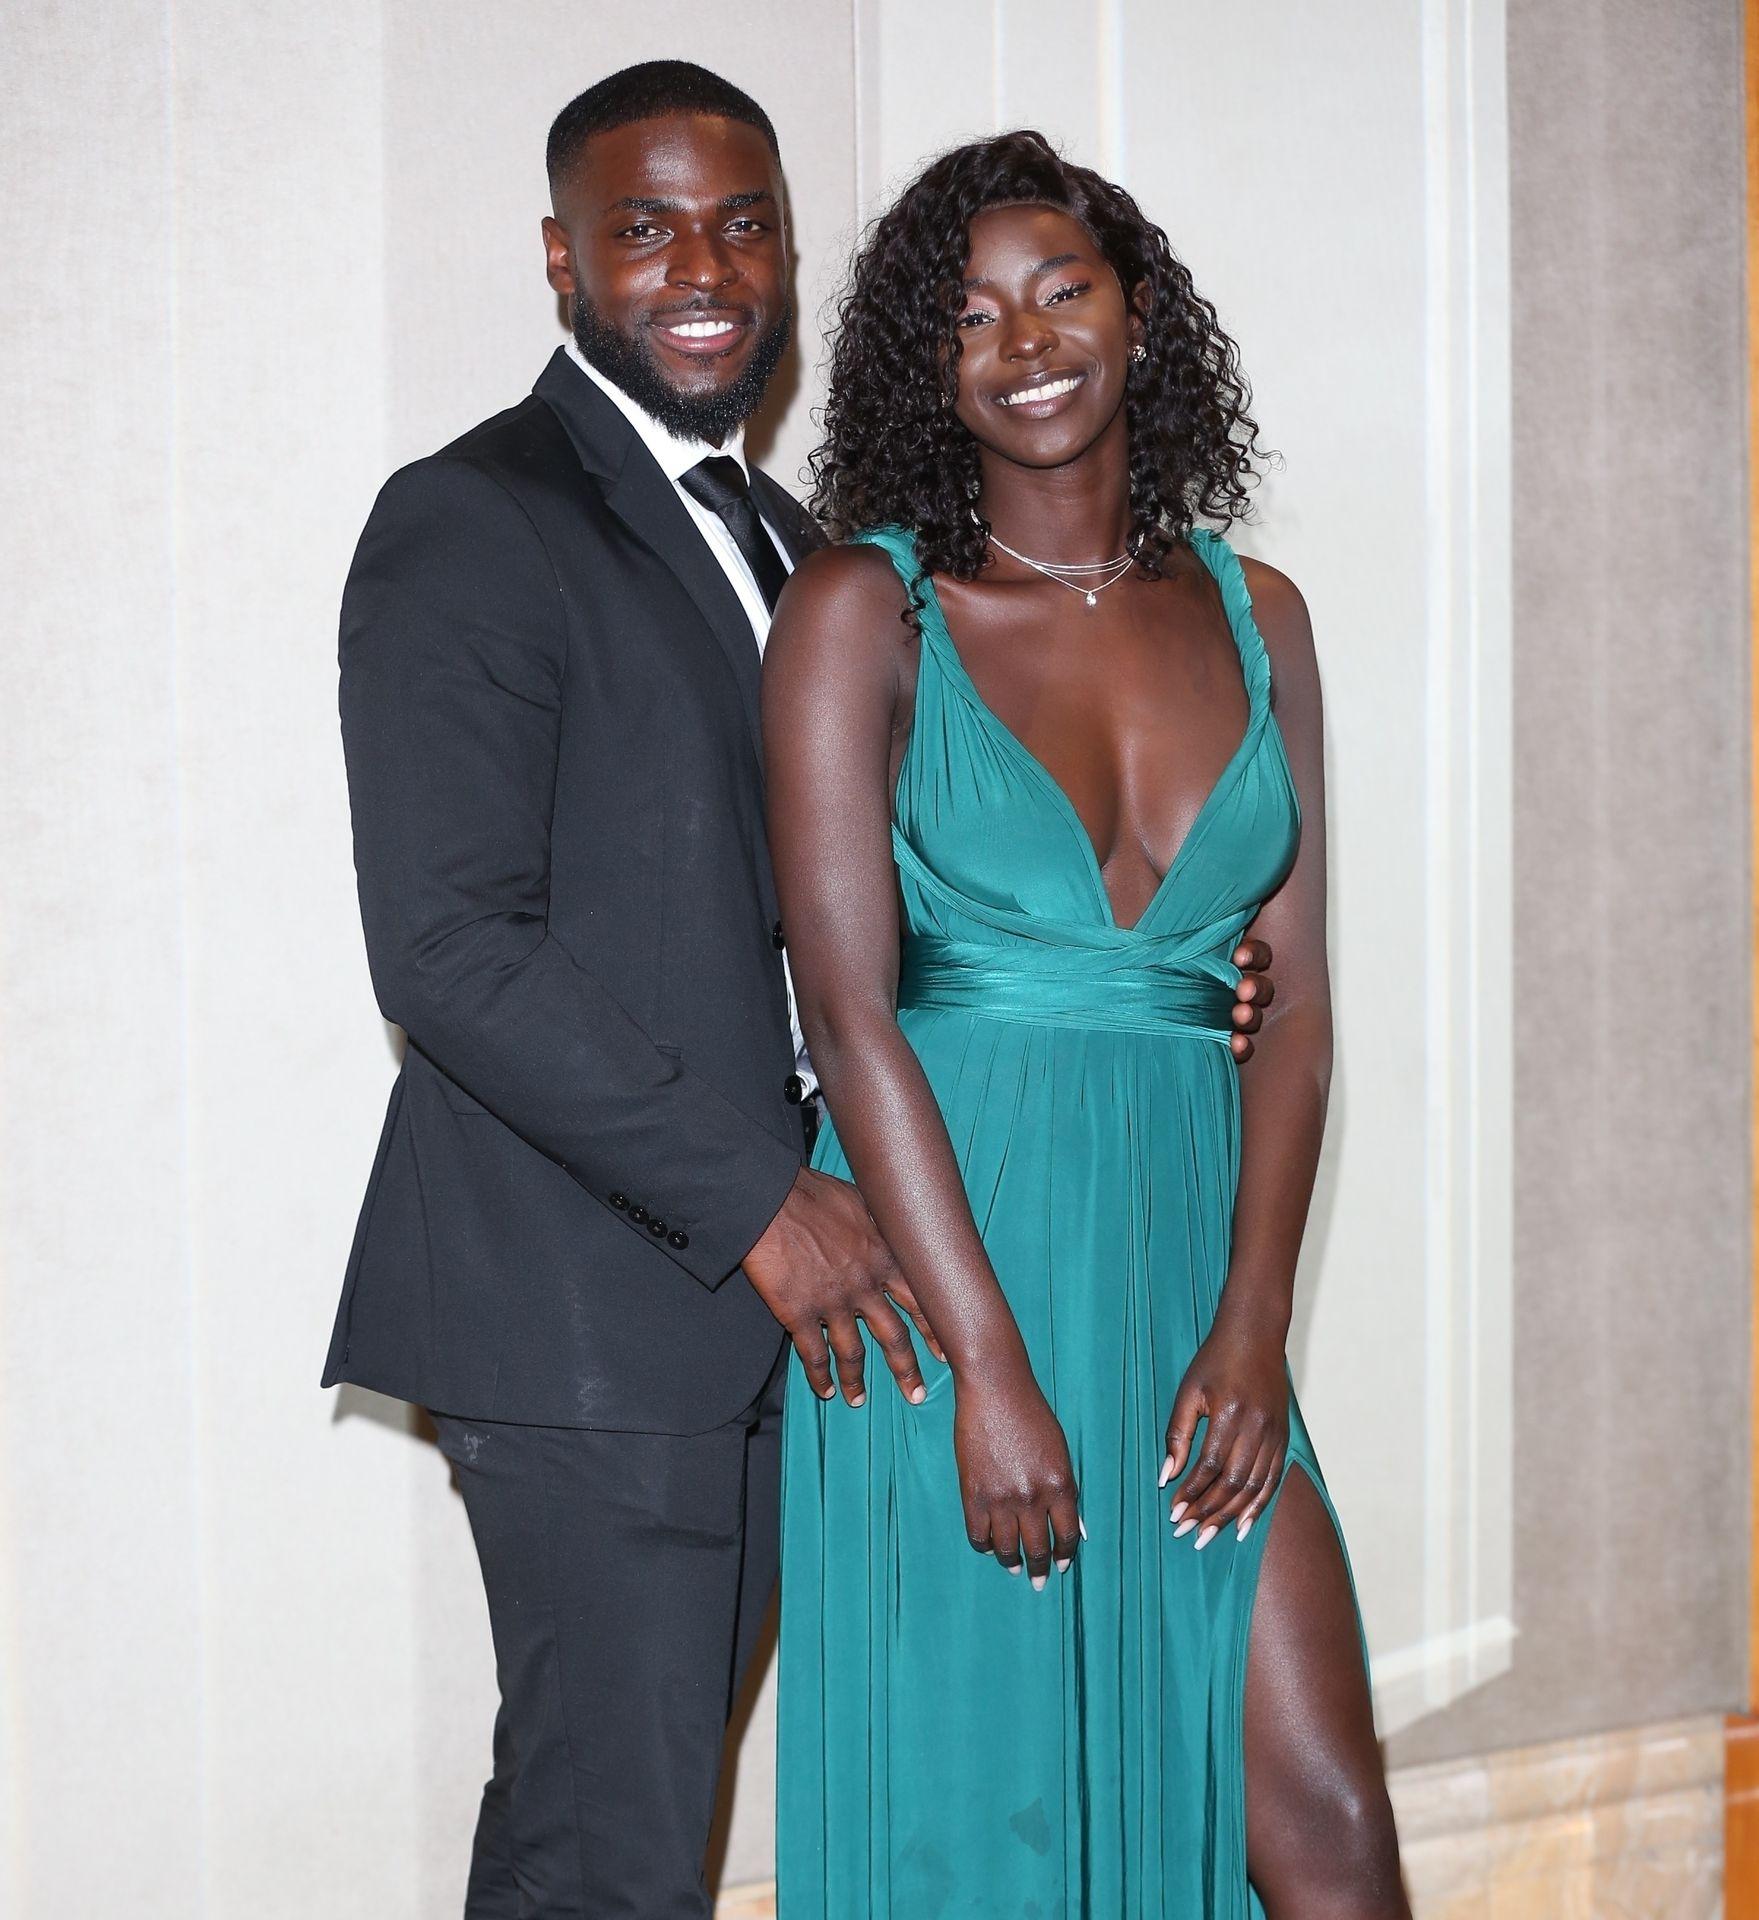 Mike Boateng & Priscilla Anyabu Are Seen At British Ethnic Diversity Sports Awards 0136